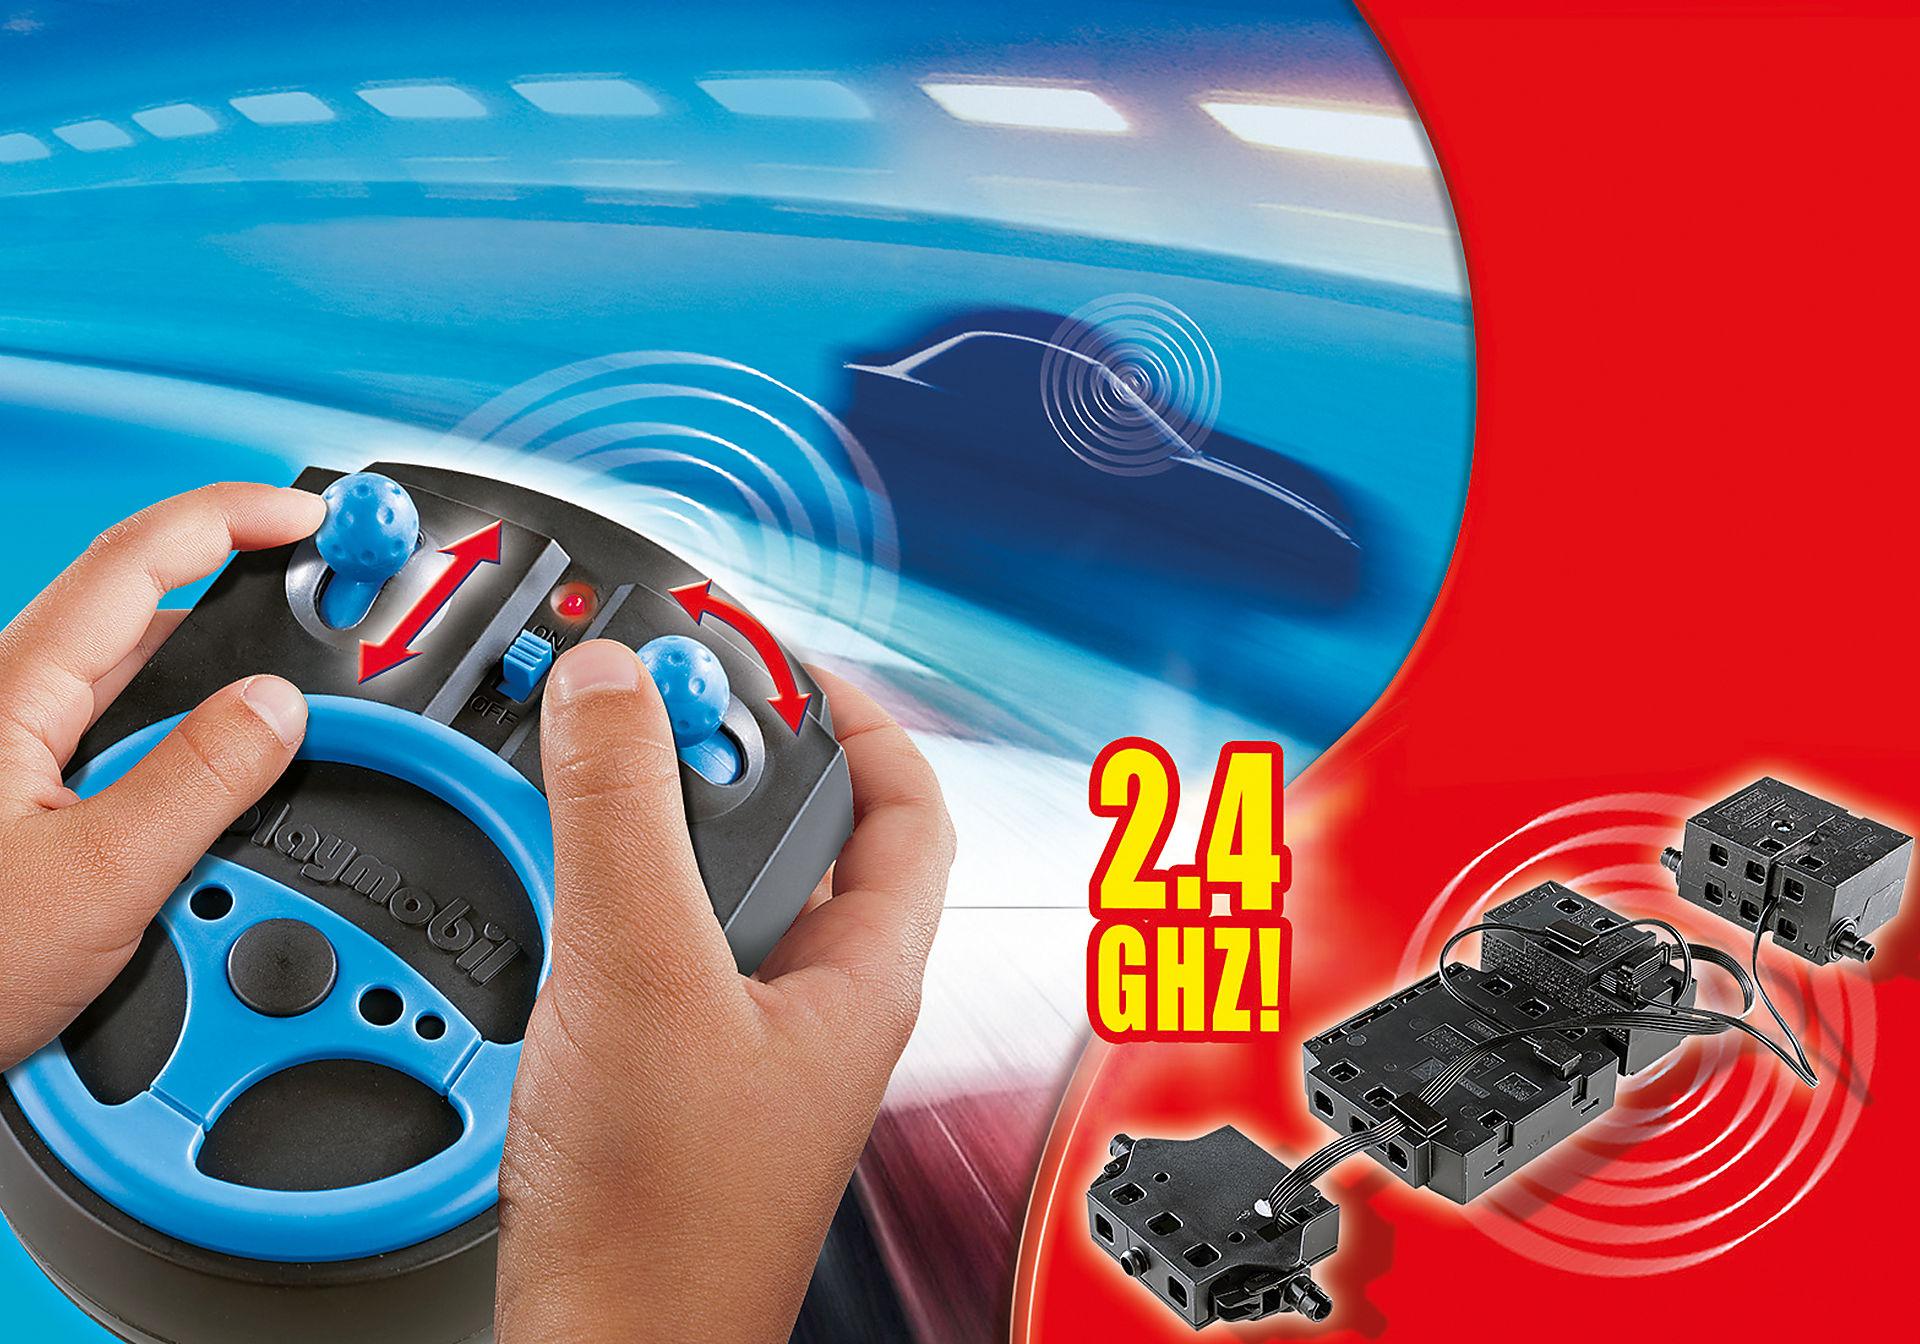 http://media.playmobil.com/i/playmobil/6914_product_detail/RC Moduł Plus Set